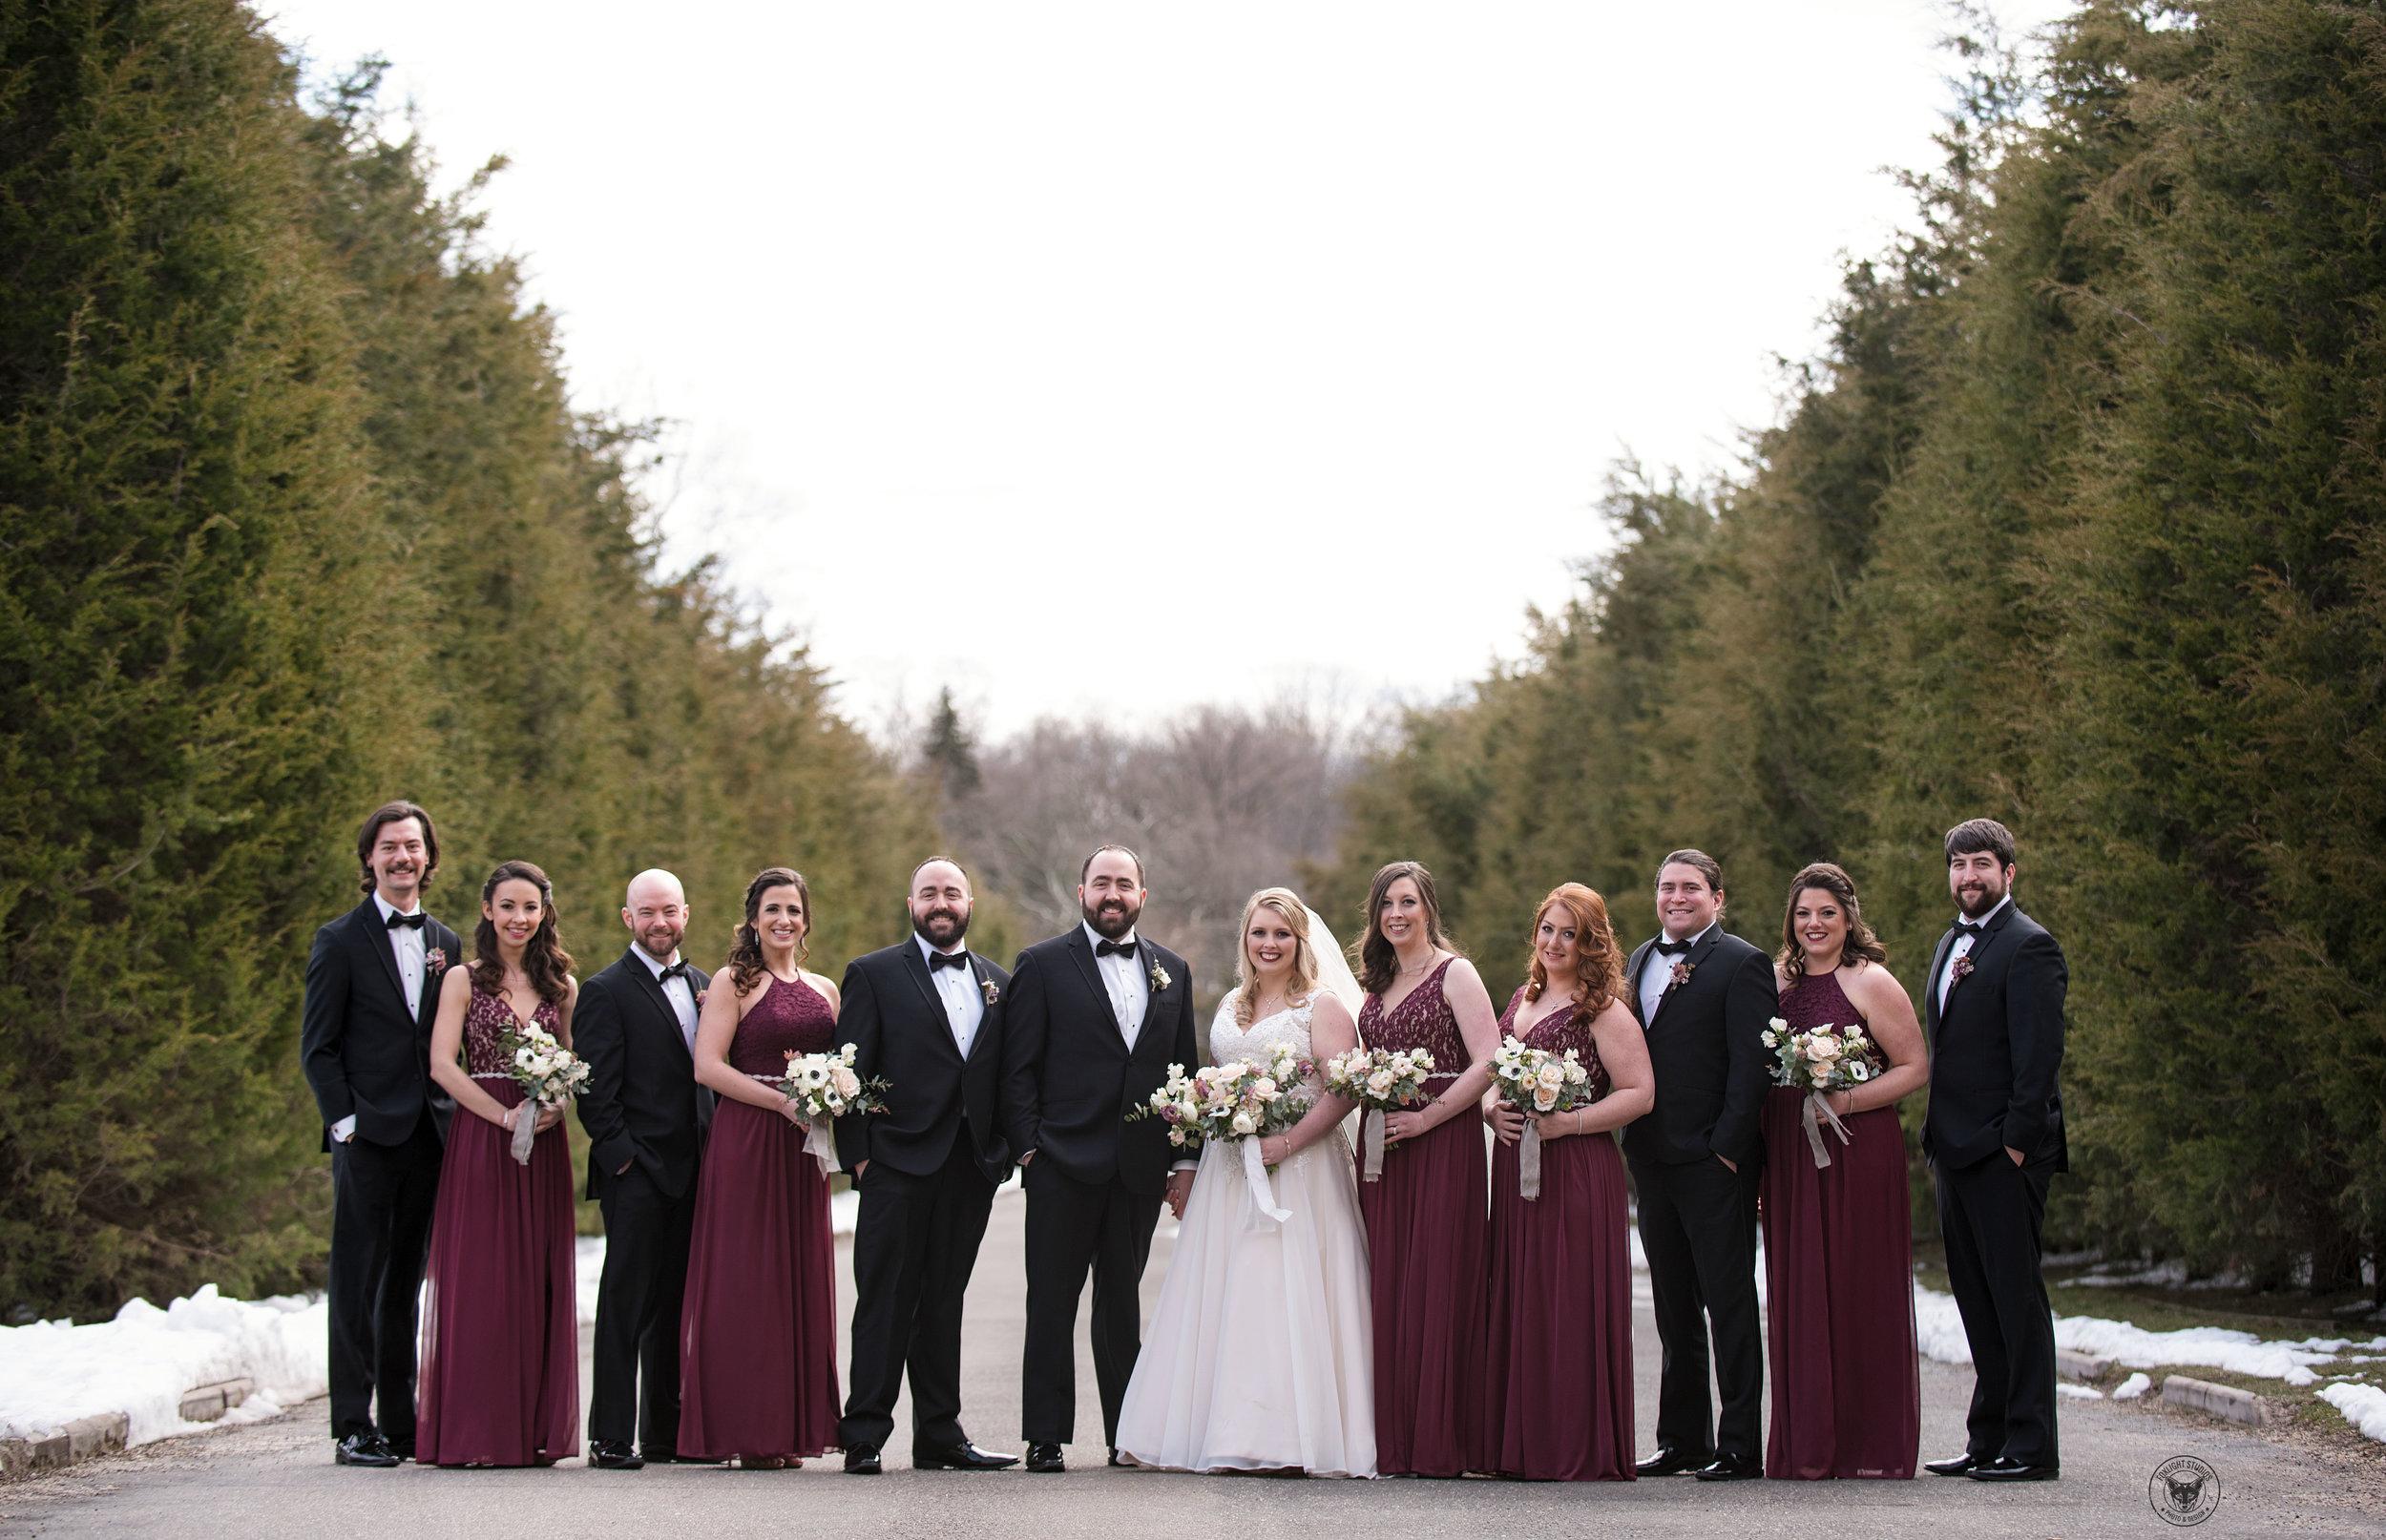 Oheka_Castle_Wedding17.jpg